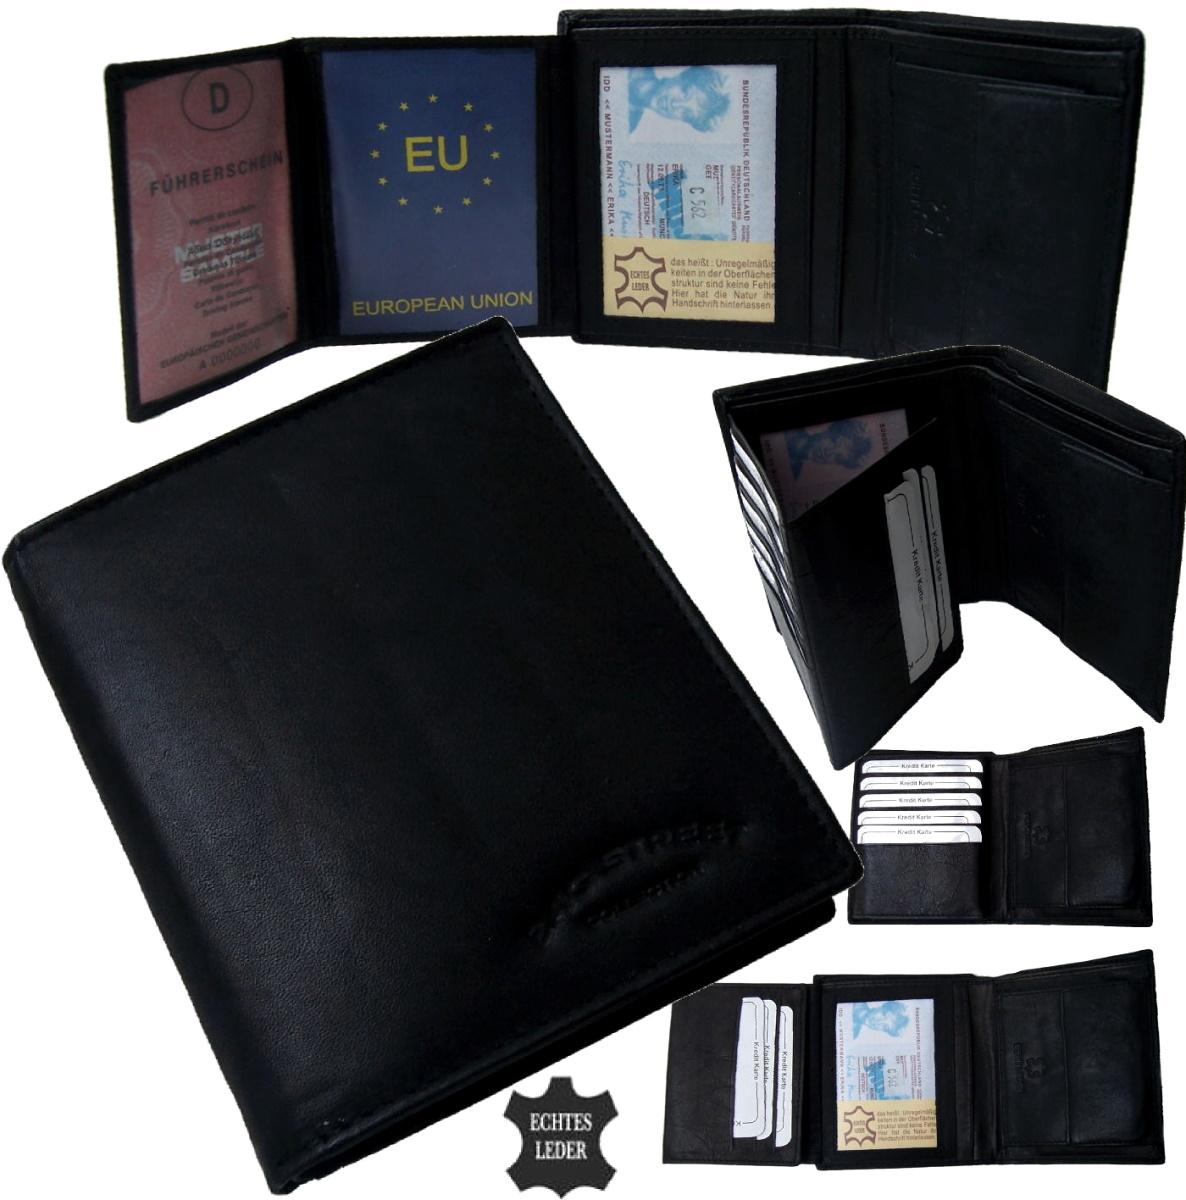 Geldbörse Herren Portemonnaie schwarz echt Leder Bag street Po2618